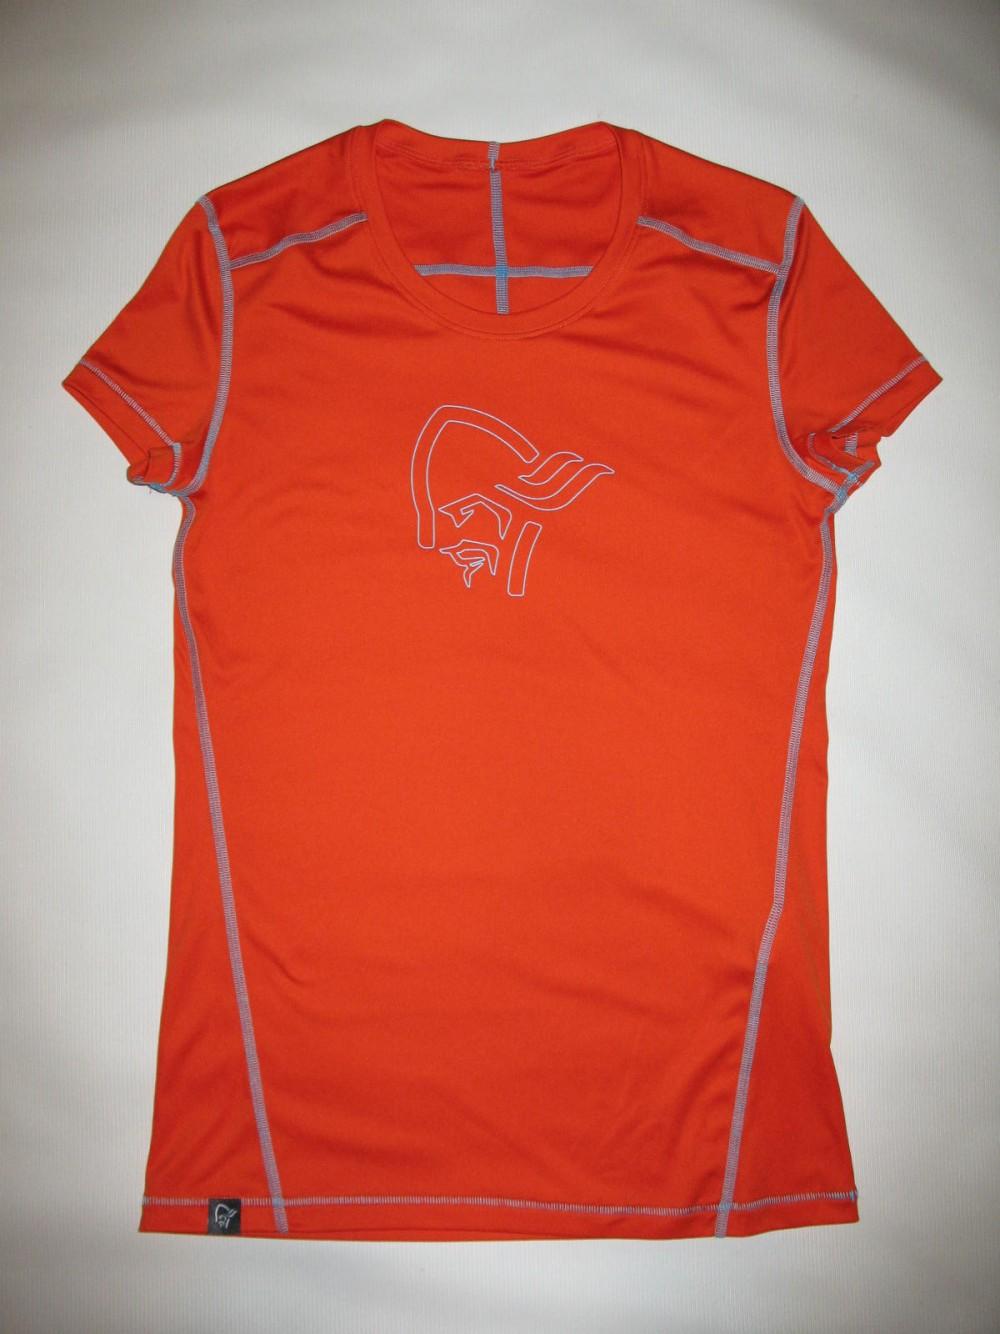 Футболка NORRONA 29 tech t-shirt lady (размер S) - 1